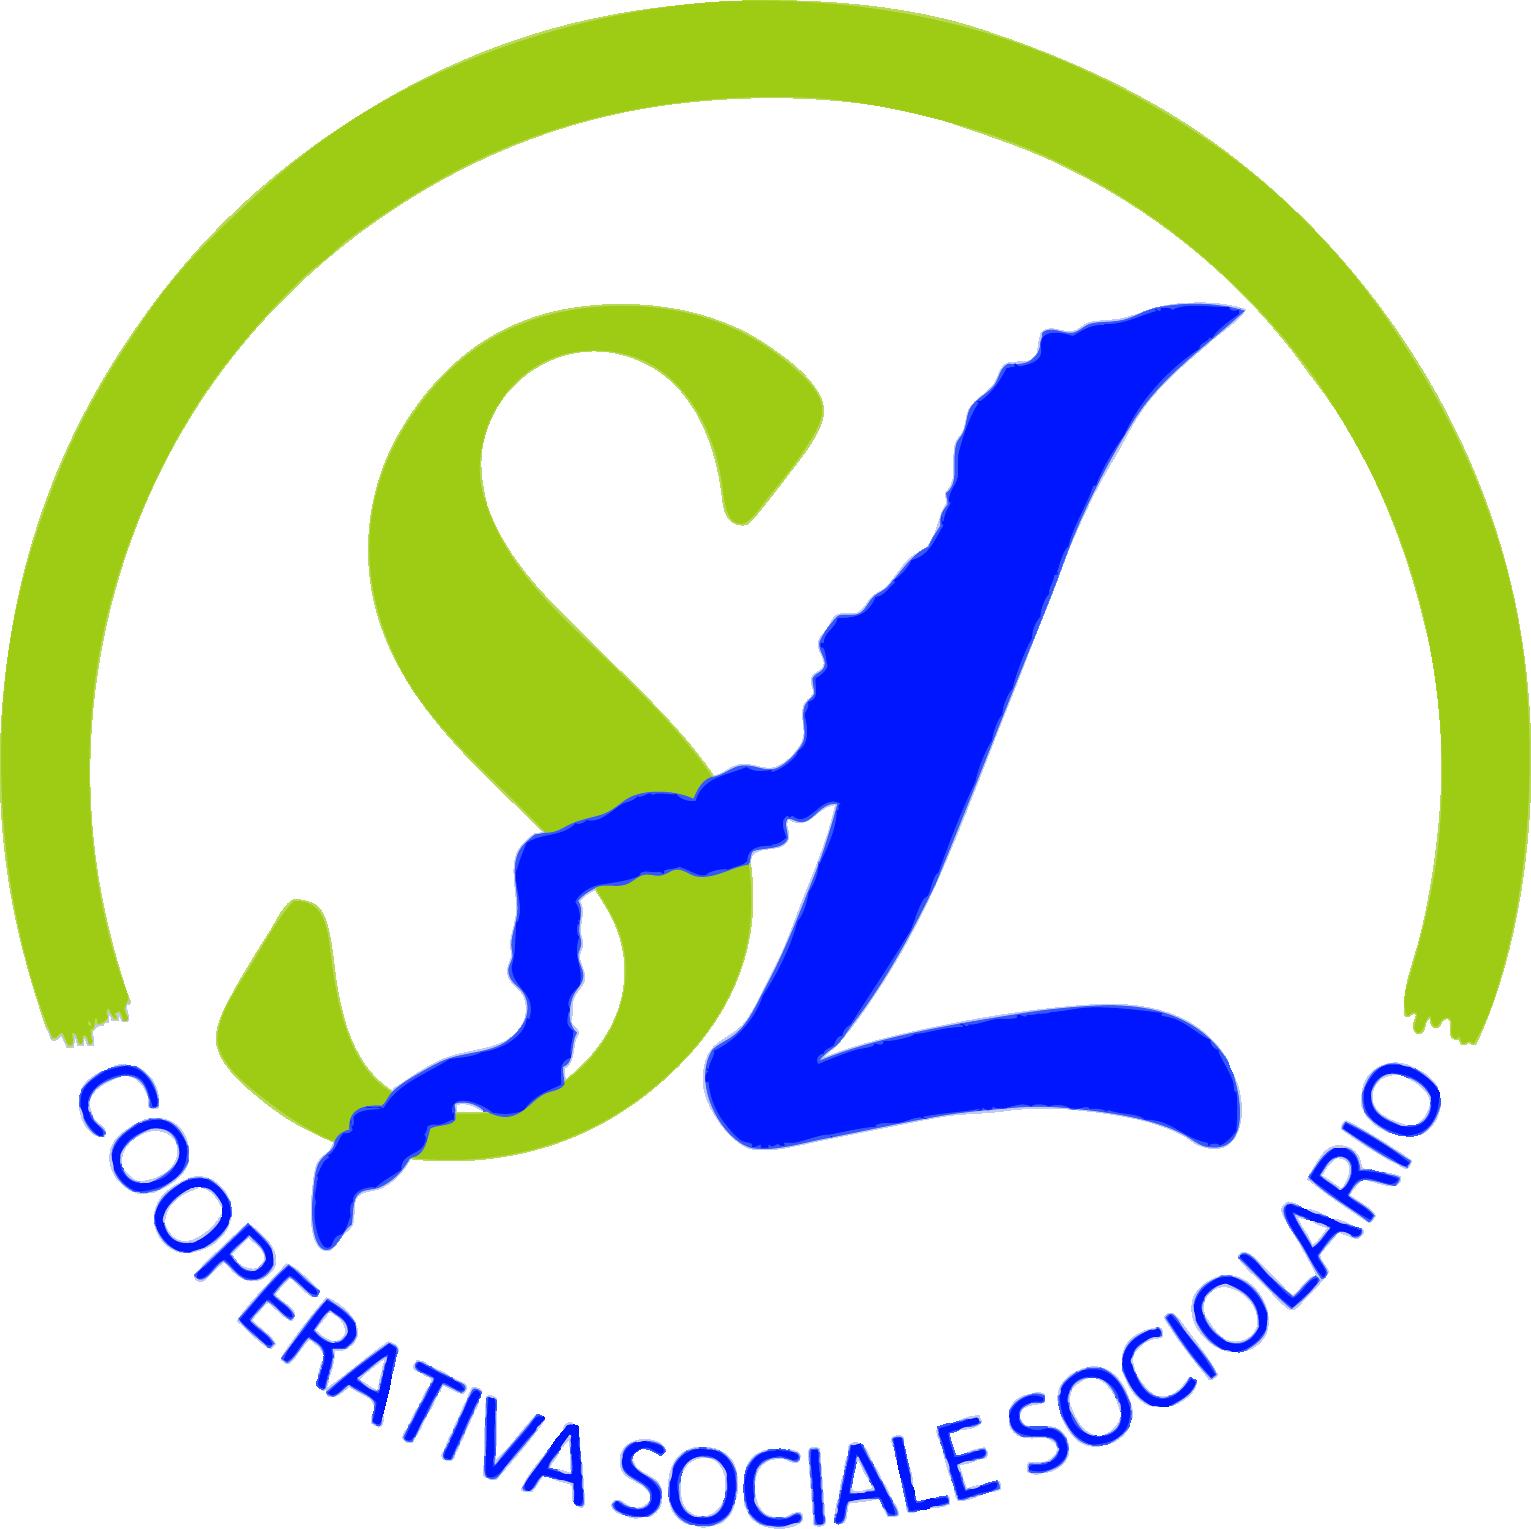 logo-sociolario-ridotto-senza-sfondo